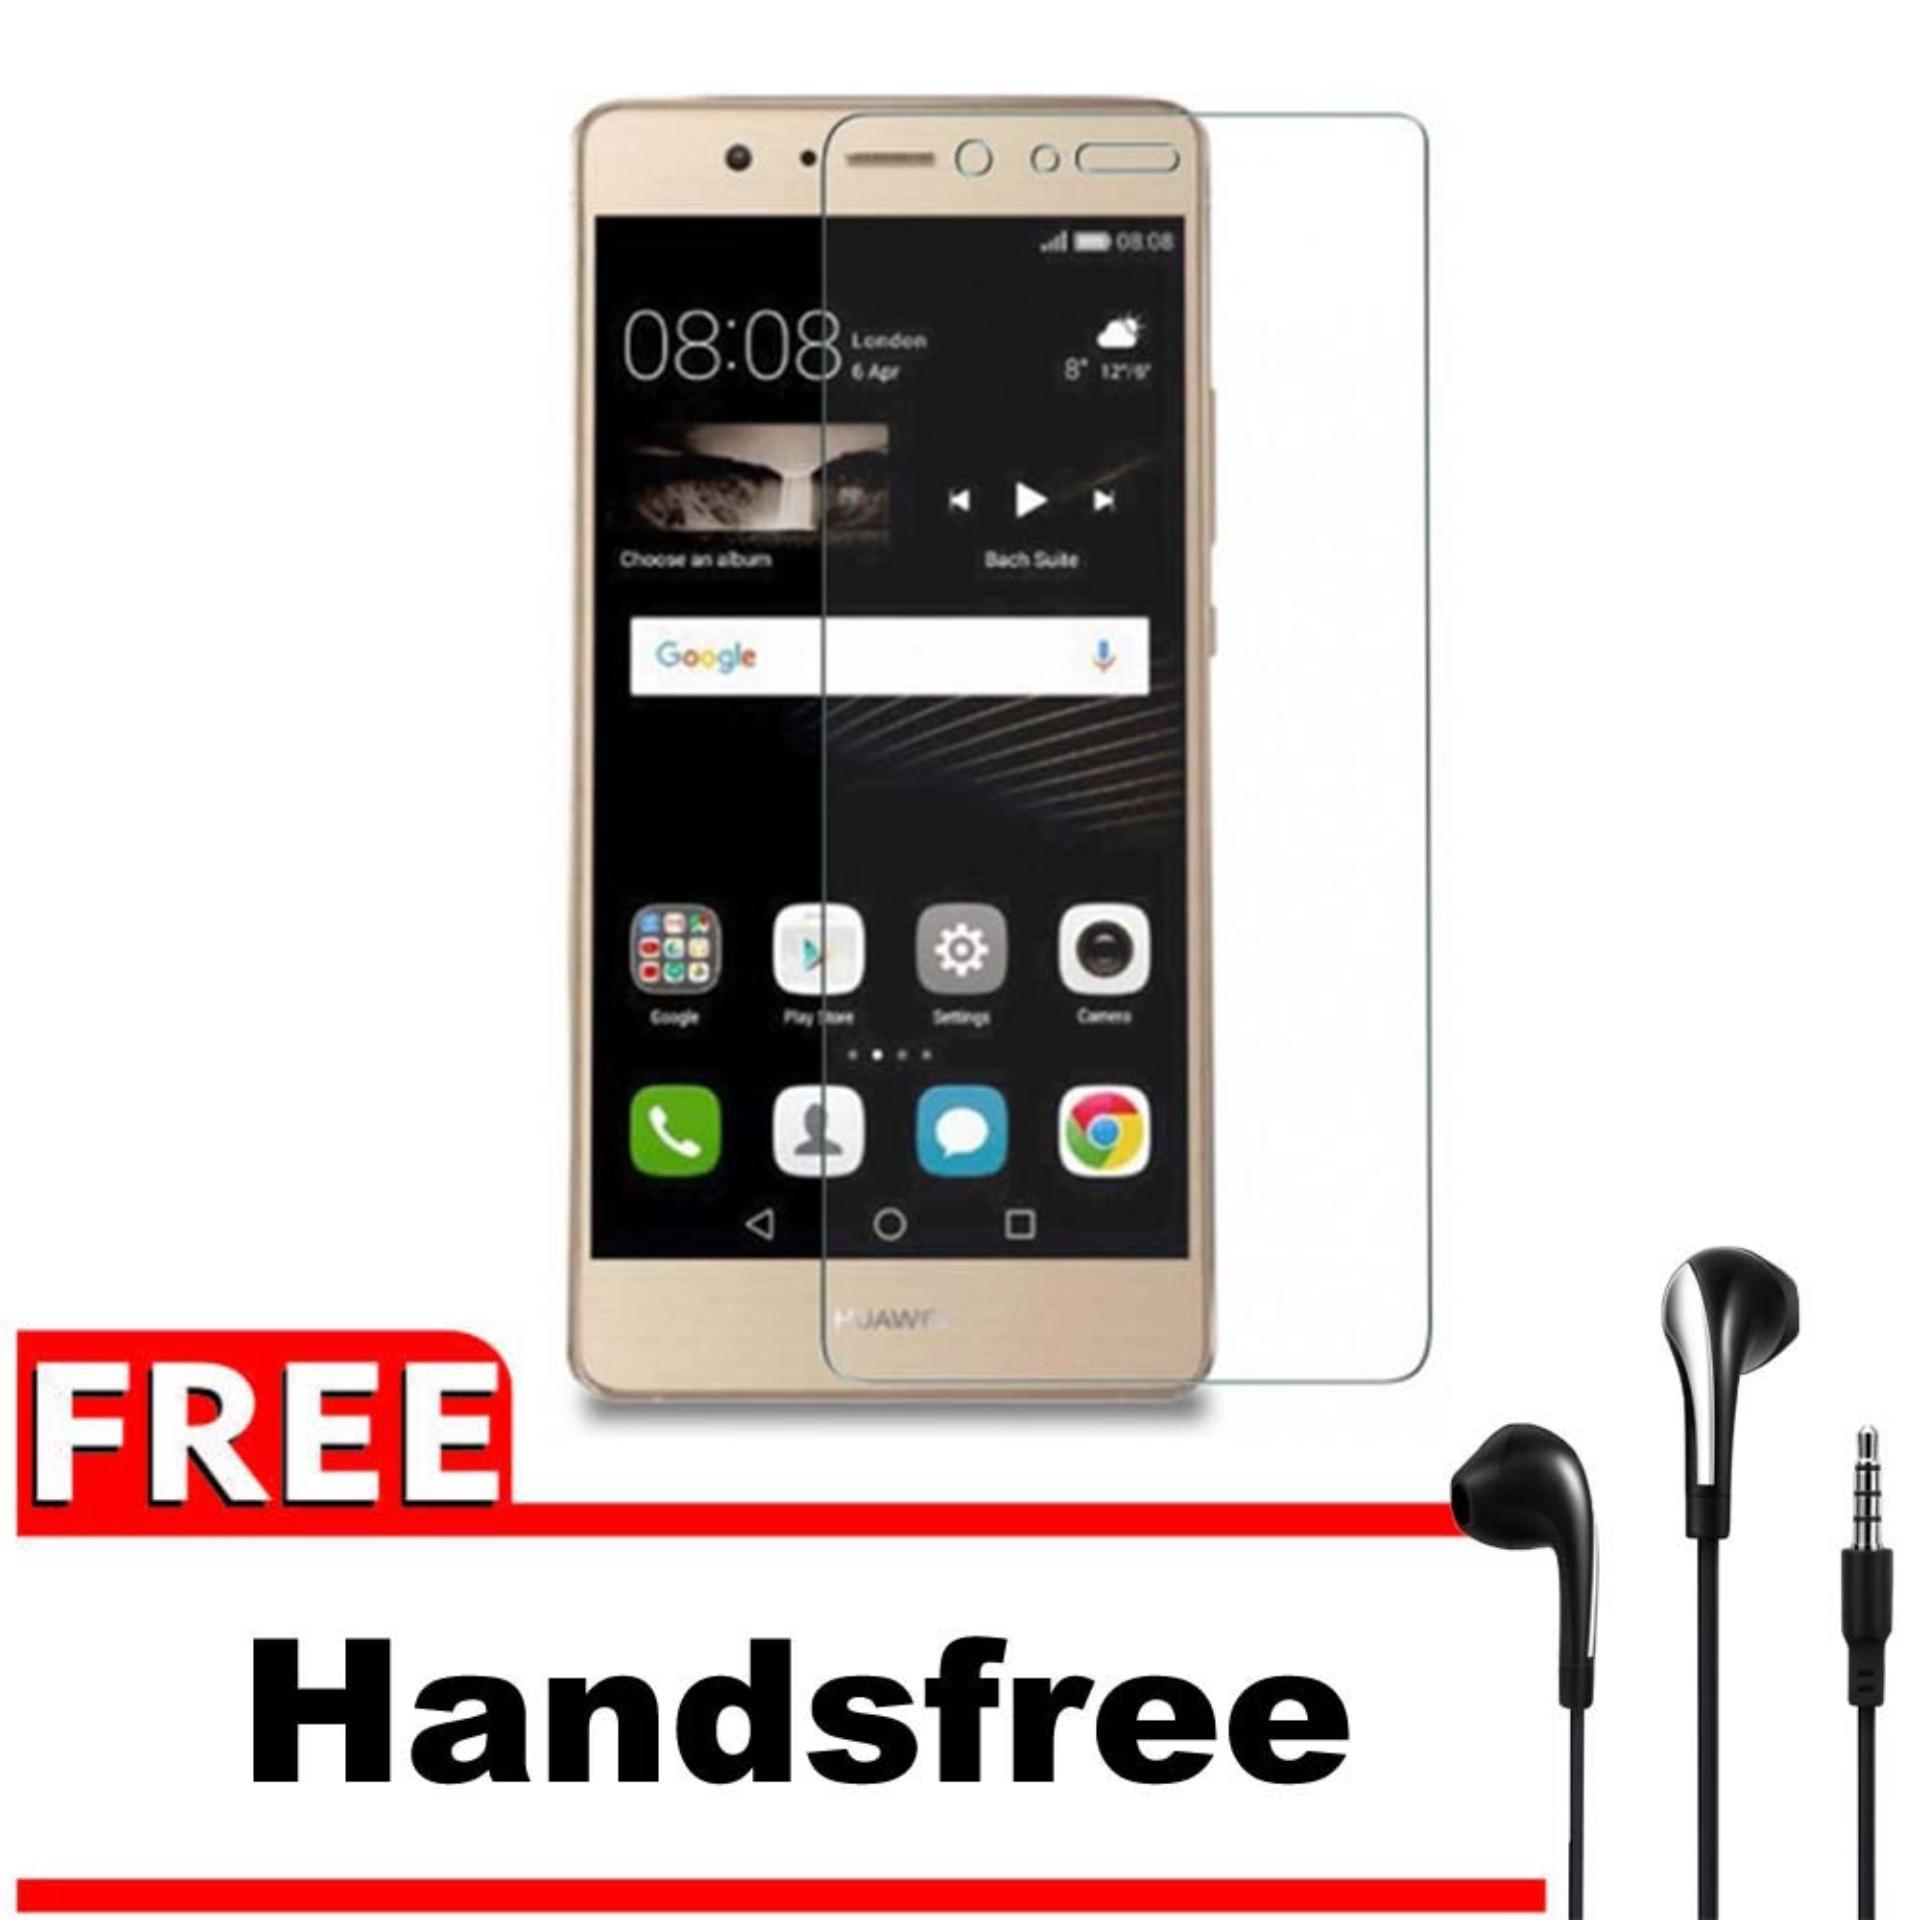 Vn Huawei Ascend GR5 / GR 5 / GR5W / Honor 5X / LTE Tempered Glass 9H Screen Protector 0.32mm + Gratis Free Handsfree Earphone Headset Universal - Bening Transparan